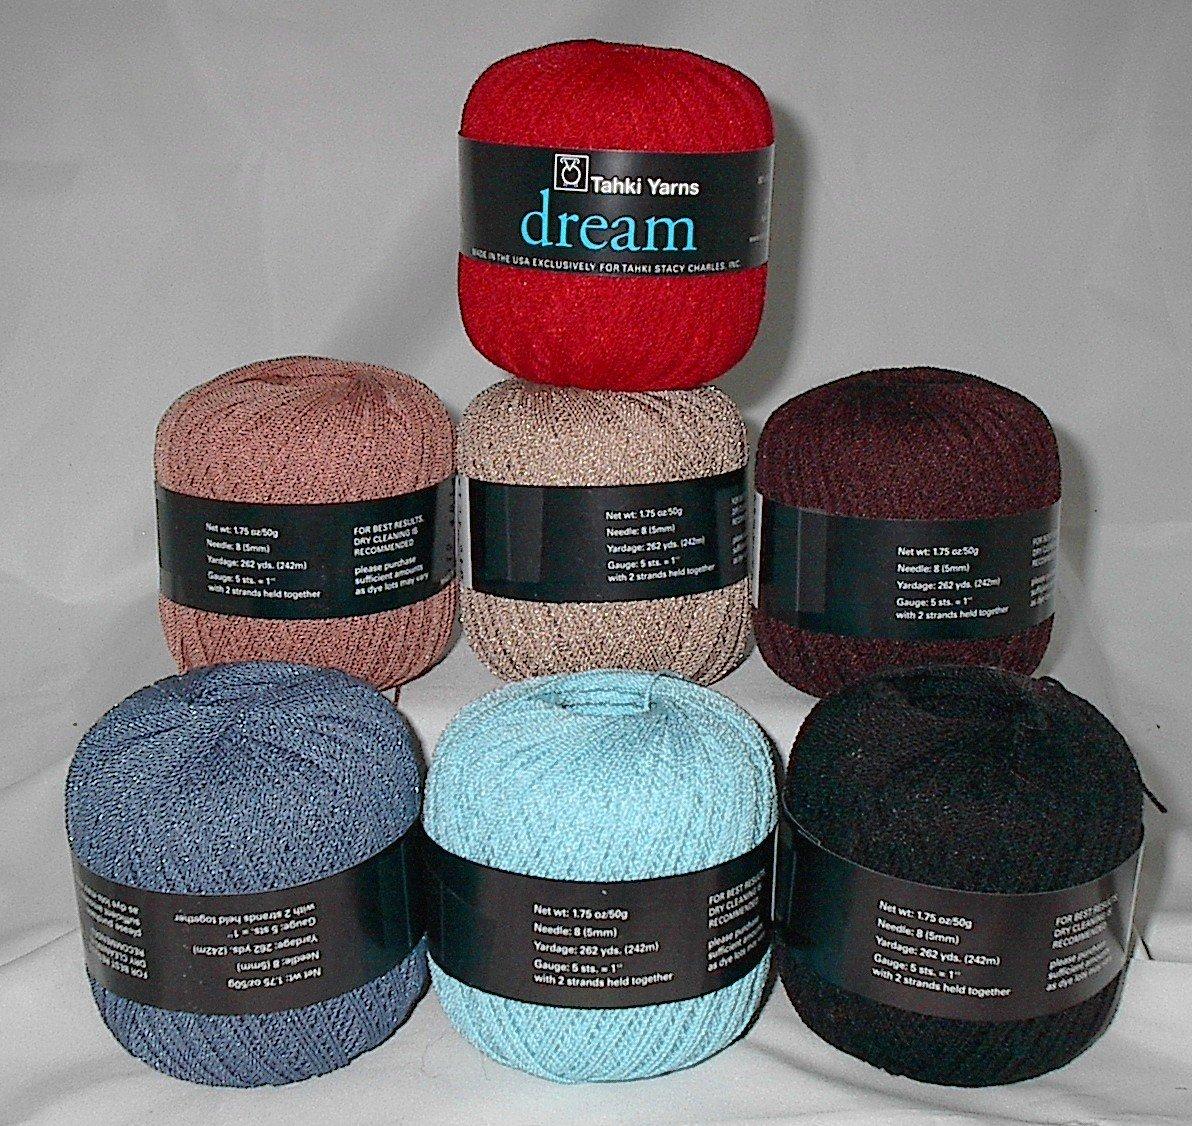 50% Discount on Tahki Dream Wool Blend Yarn Black #015